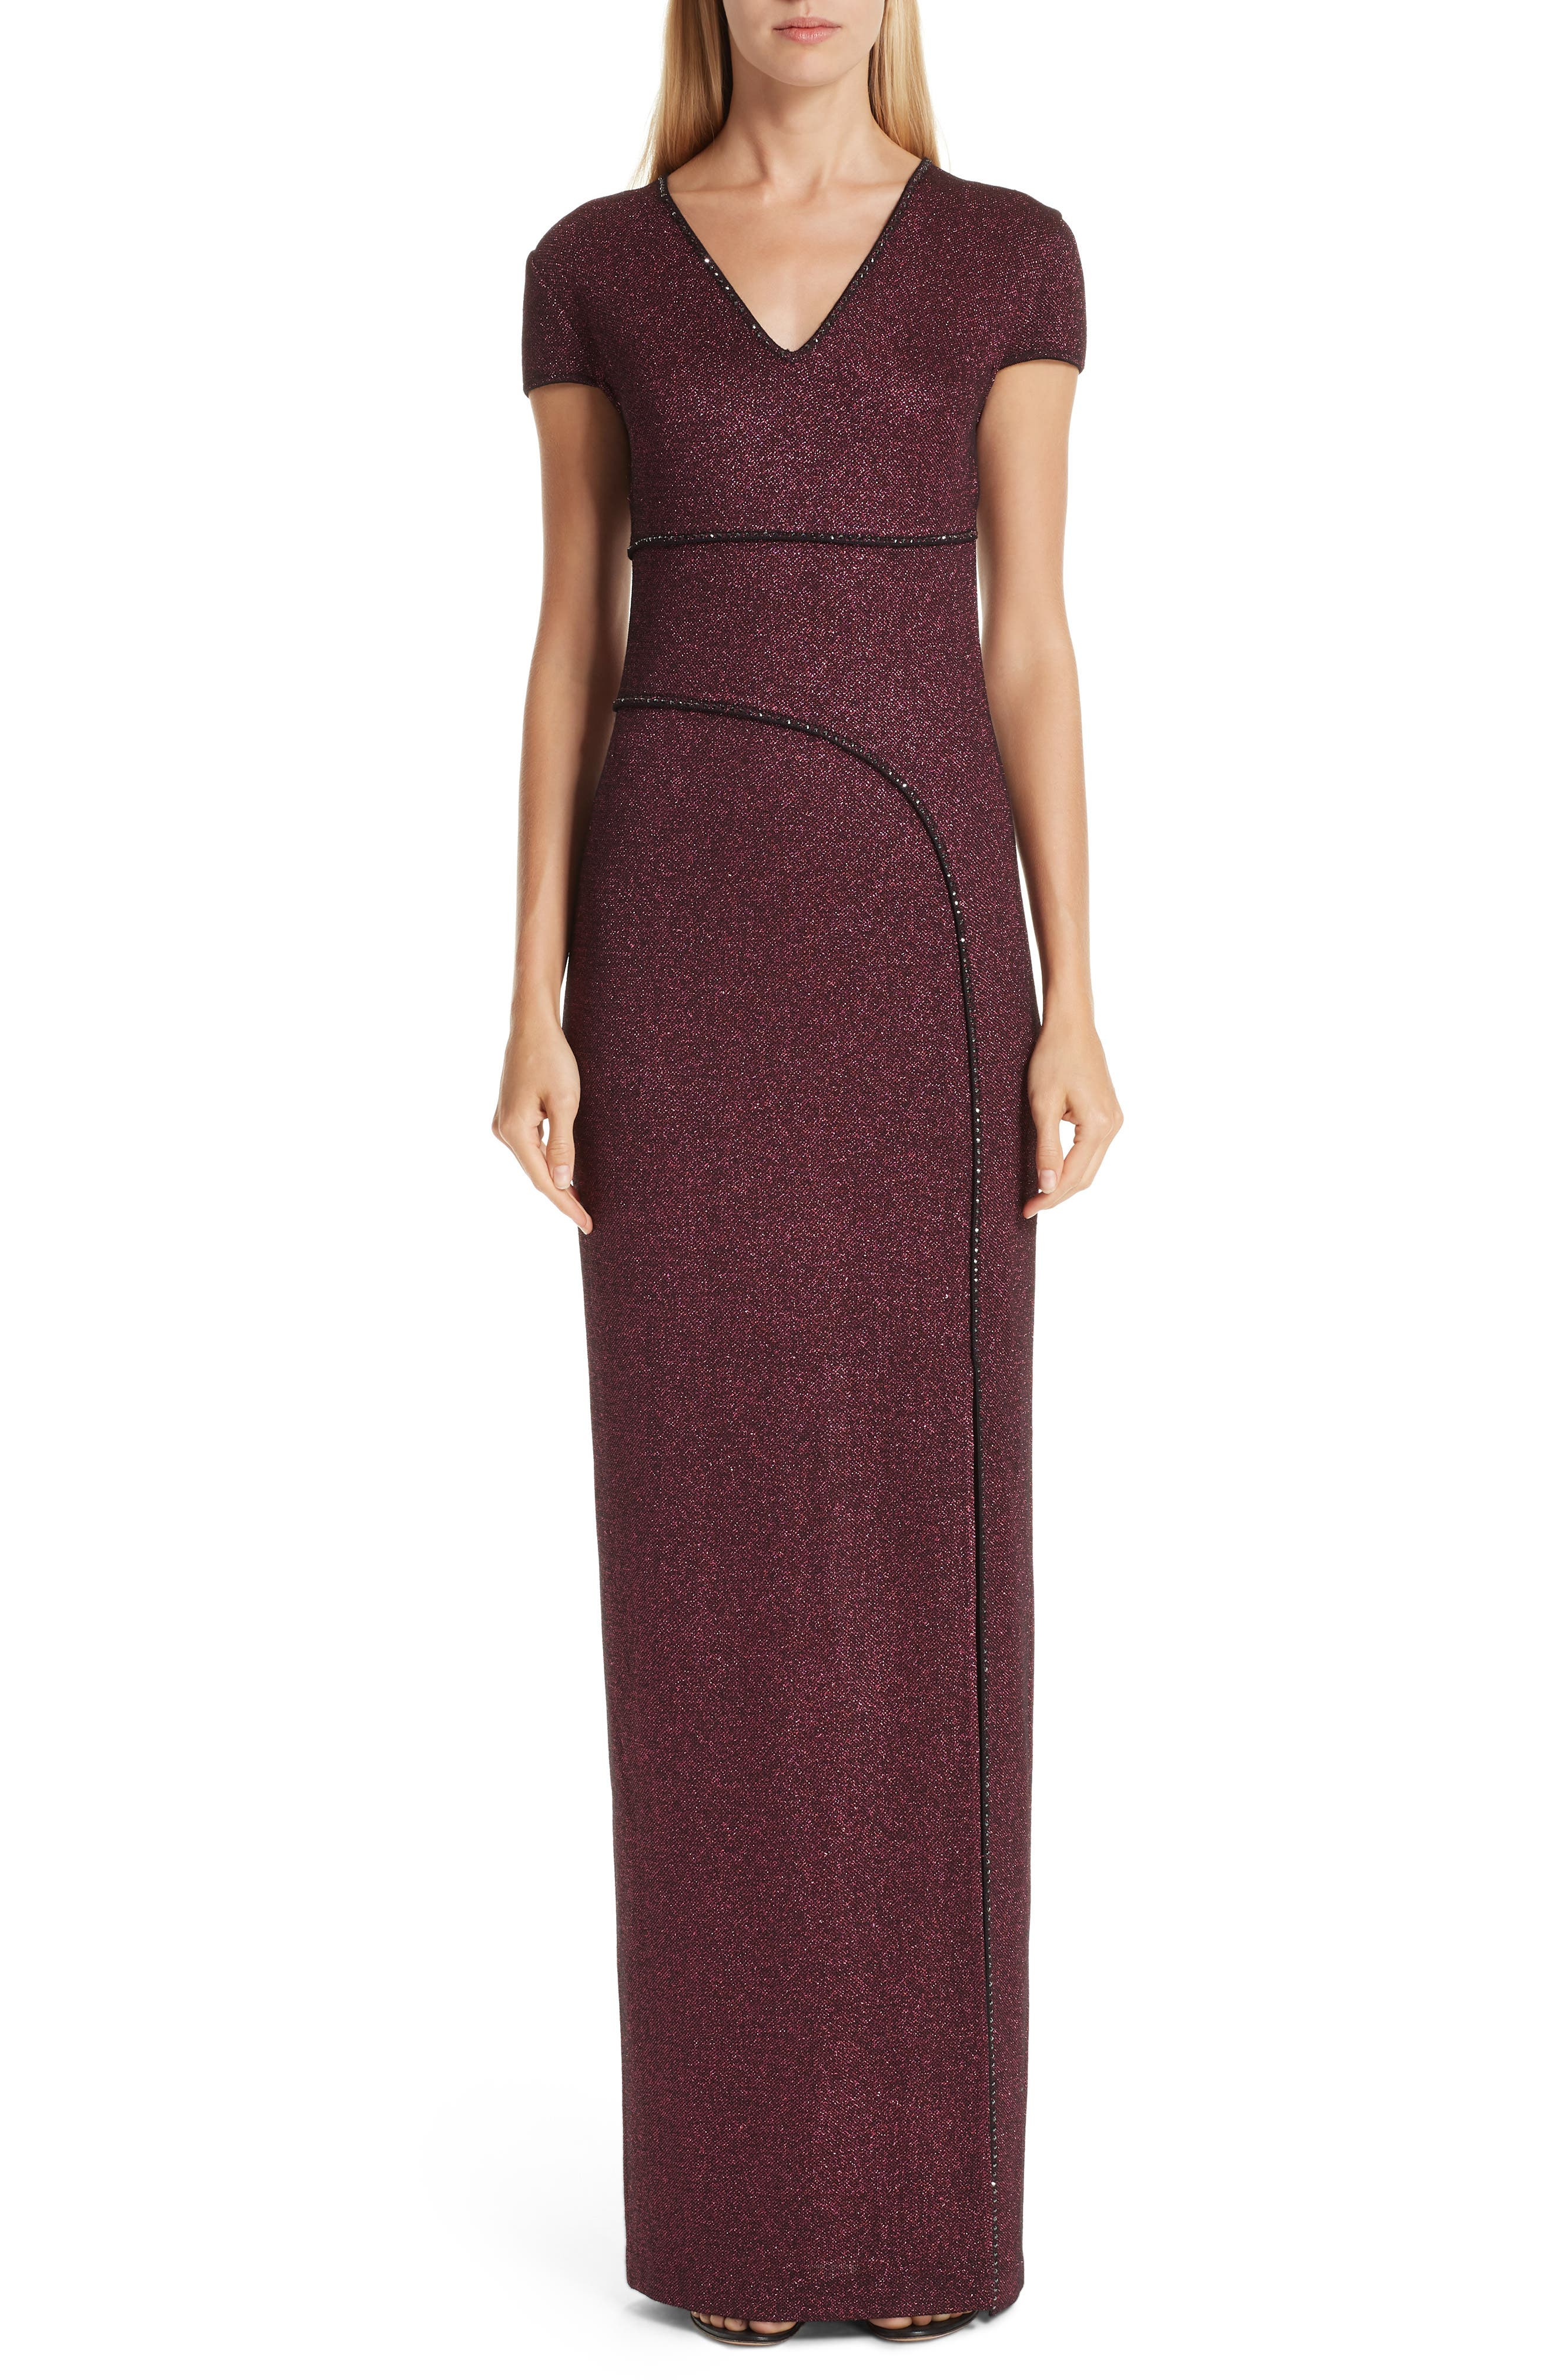 Mod Metallic Knit Cap-Sleeve Column Gown in Dark Pink Multi